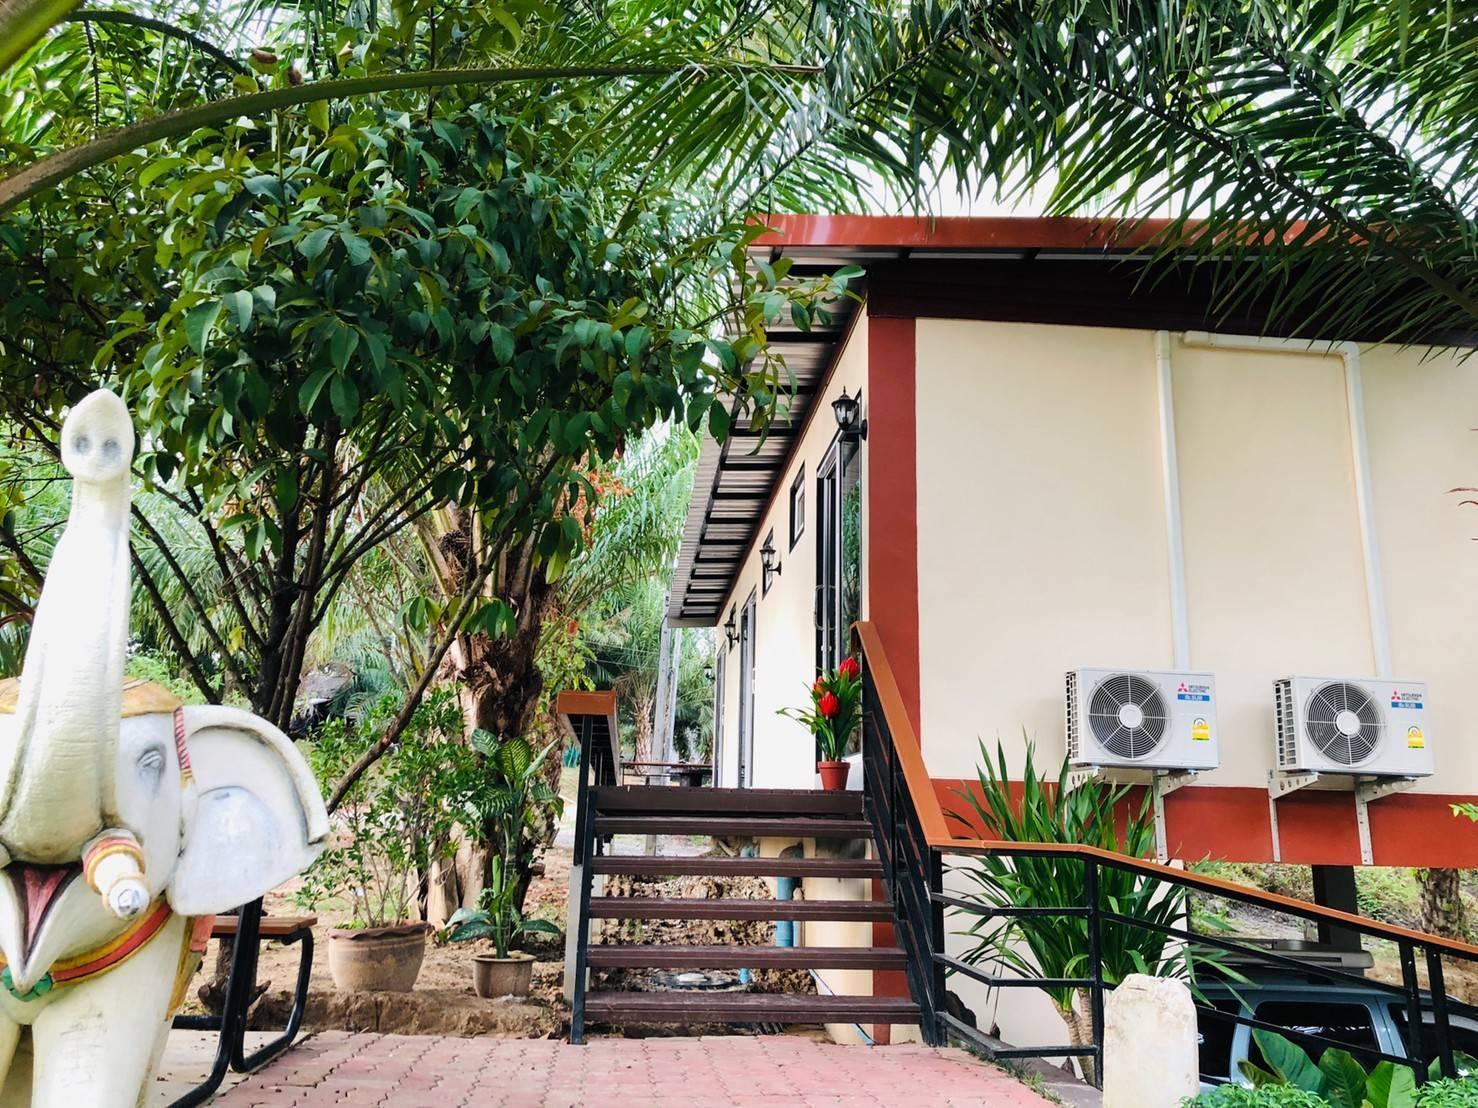 SookKaMol Resort วิลลา 4 ห้องนอน 1 ห้องน้ำส่วนตัว ขนาด 40 ตร.ม. – บ้านในช่อง